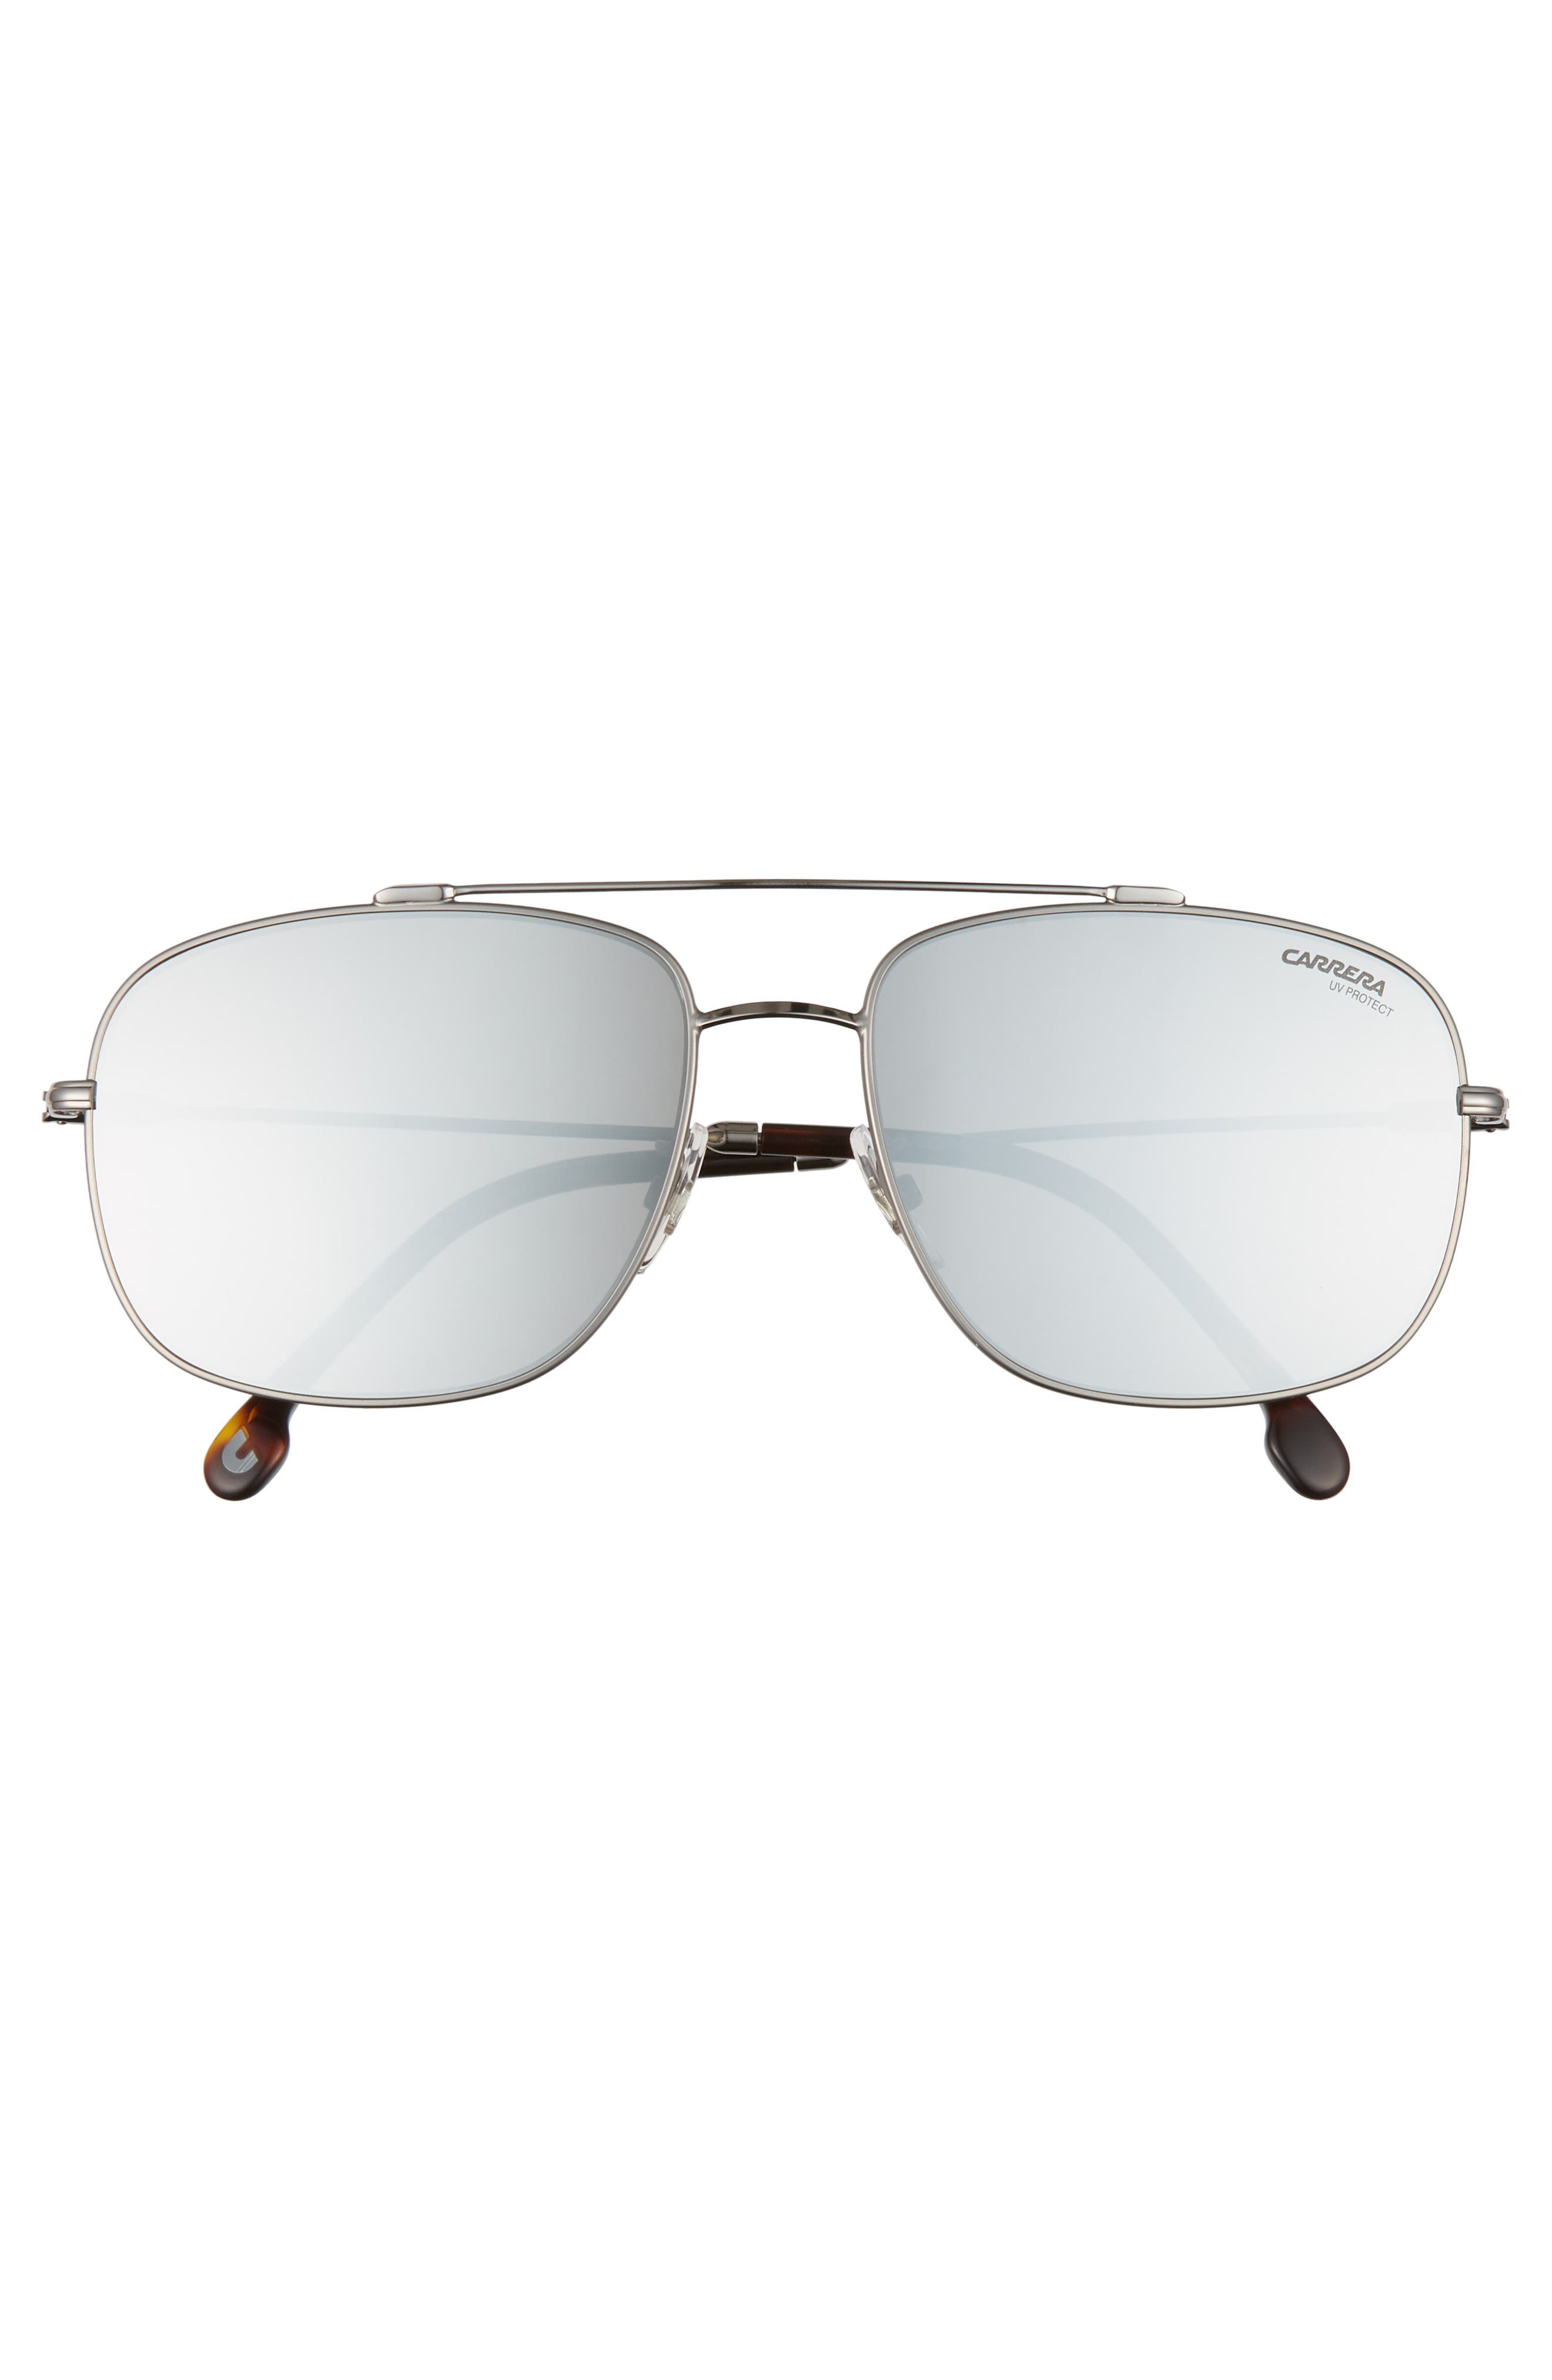 60mm Special Fit Aviator Sunglasses,                             Alternate thumbnail 2, color,                             RUTHENIUM